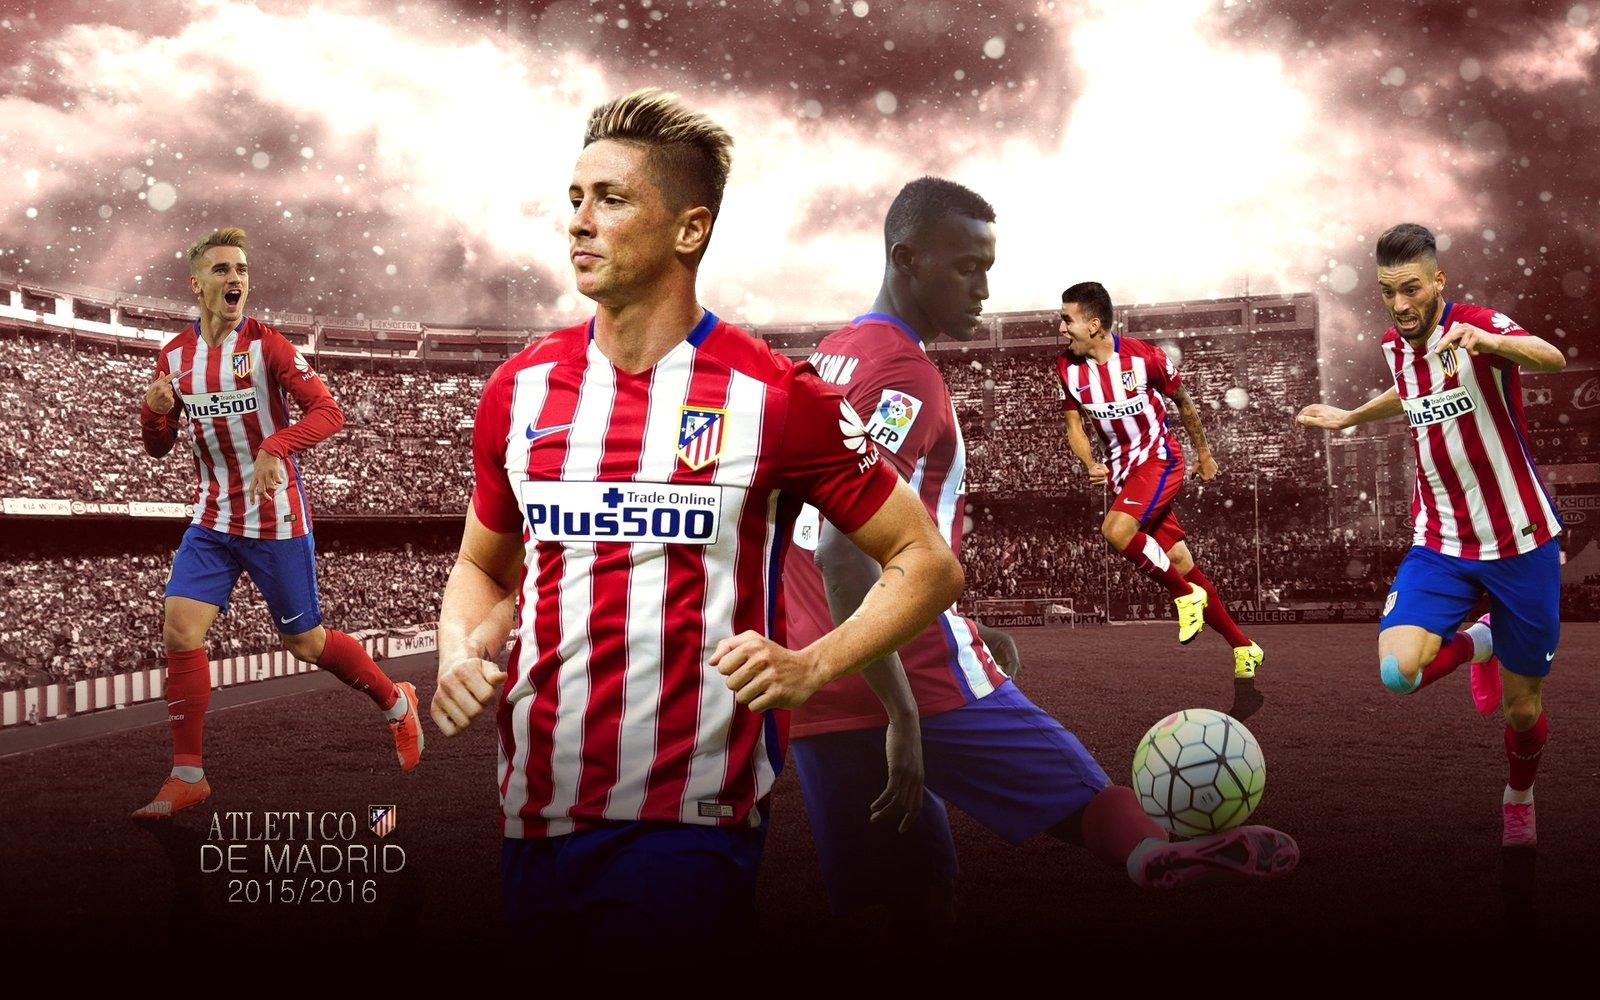 Atletico Madrid Wallpaper 2015 16 by ChrisRamos4 1600x1000